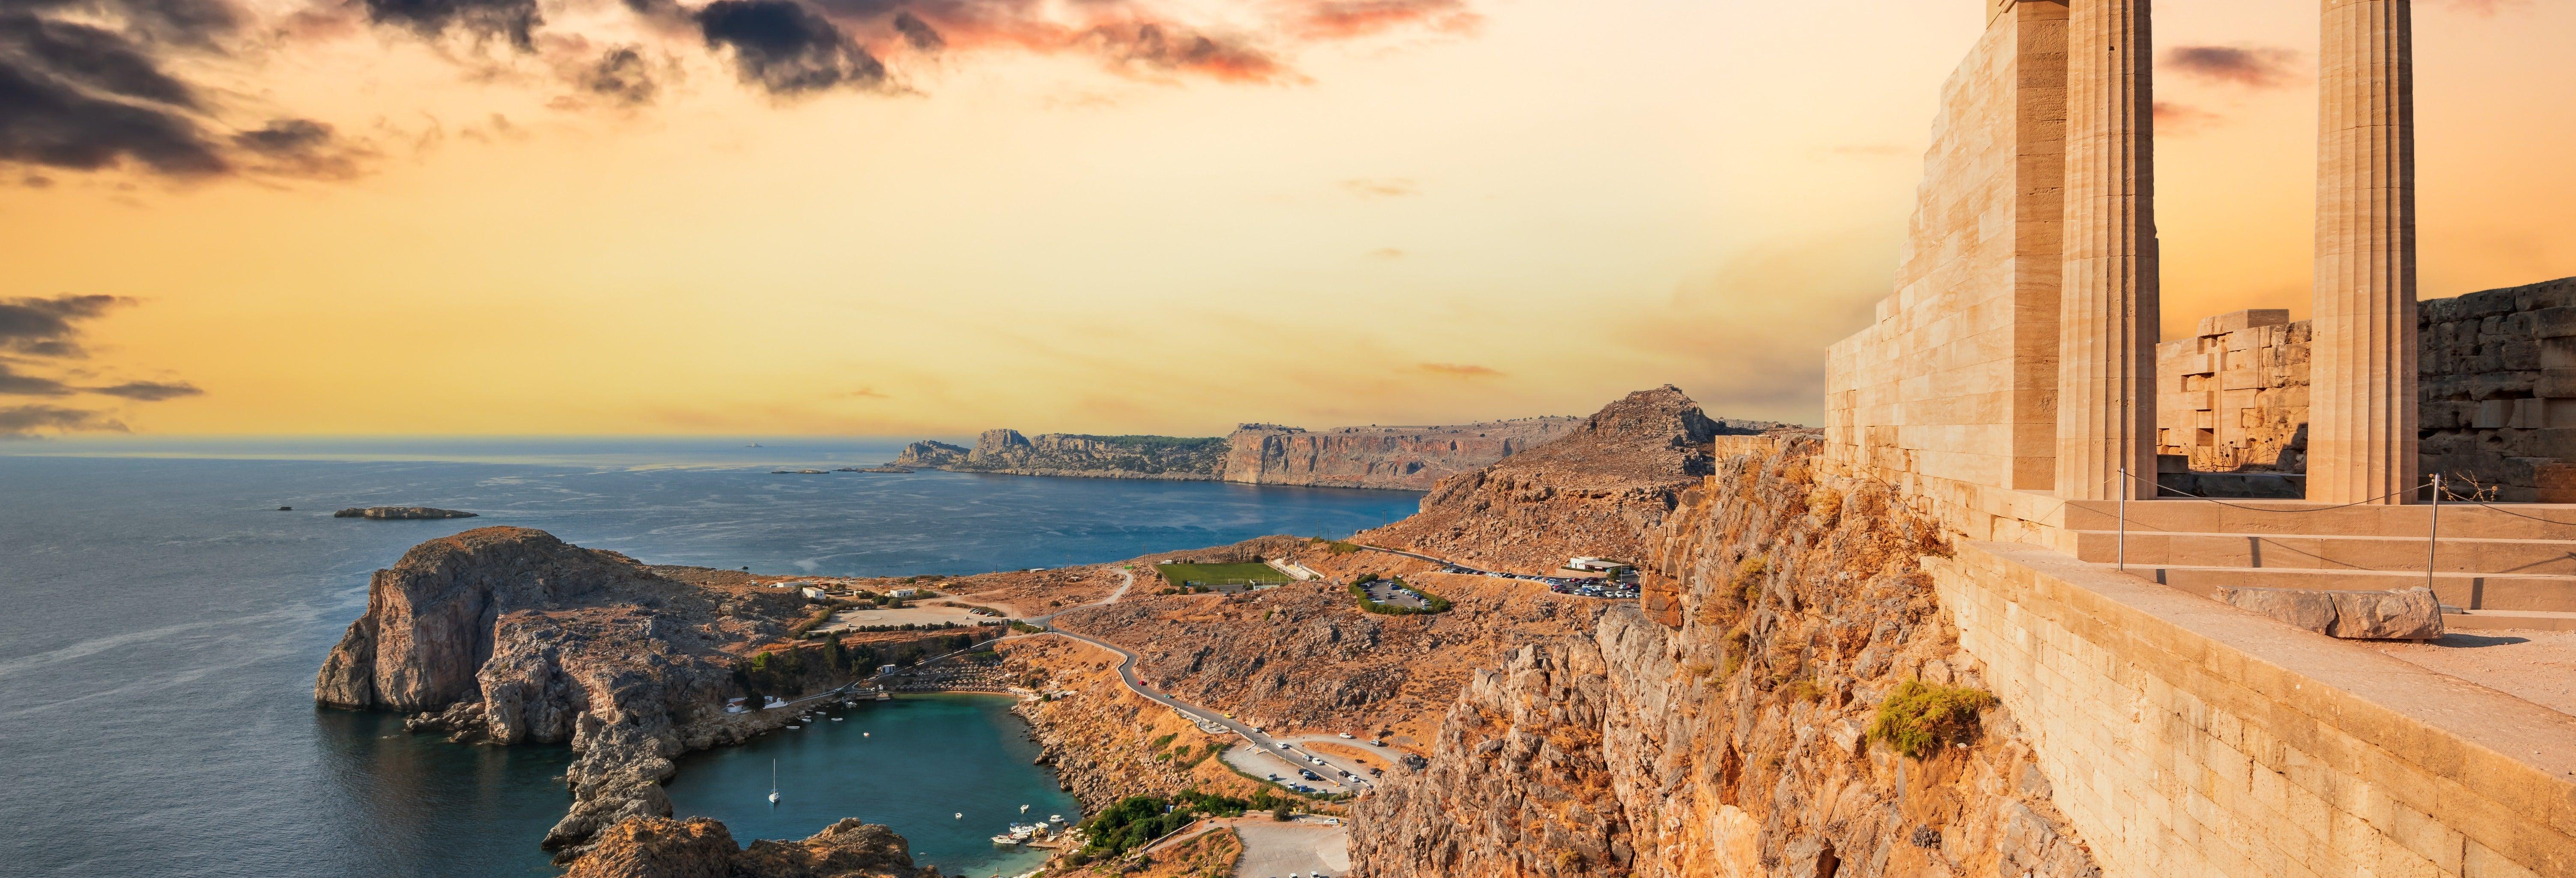 Rhodes Hop-On-Hop-Off Bus